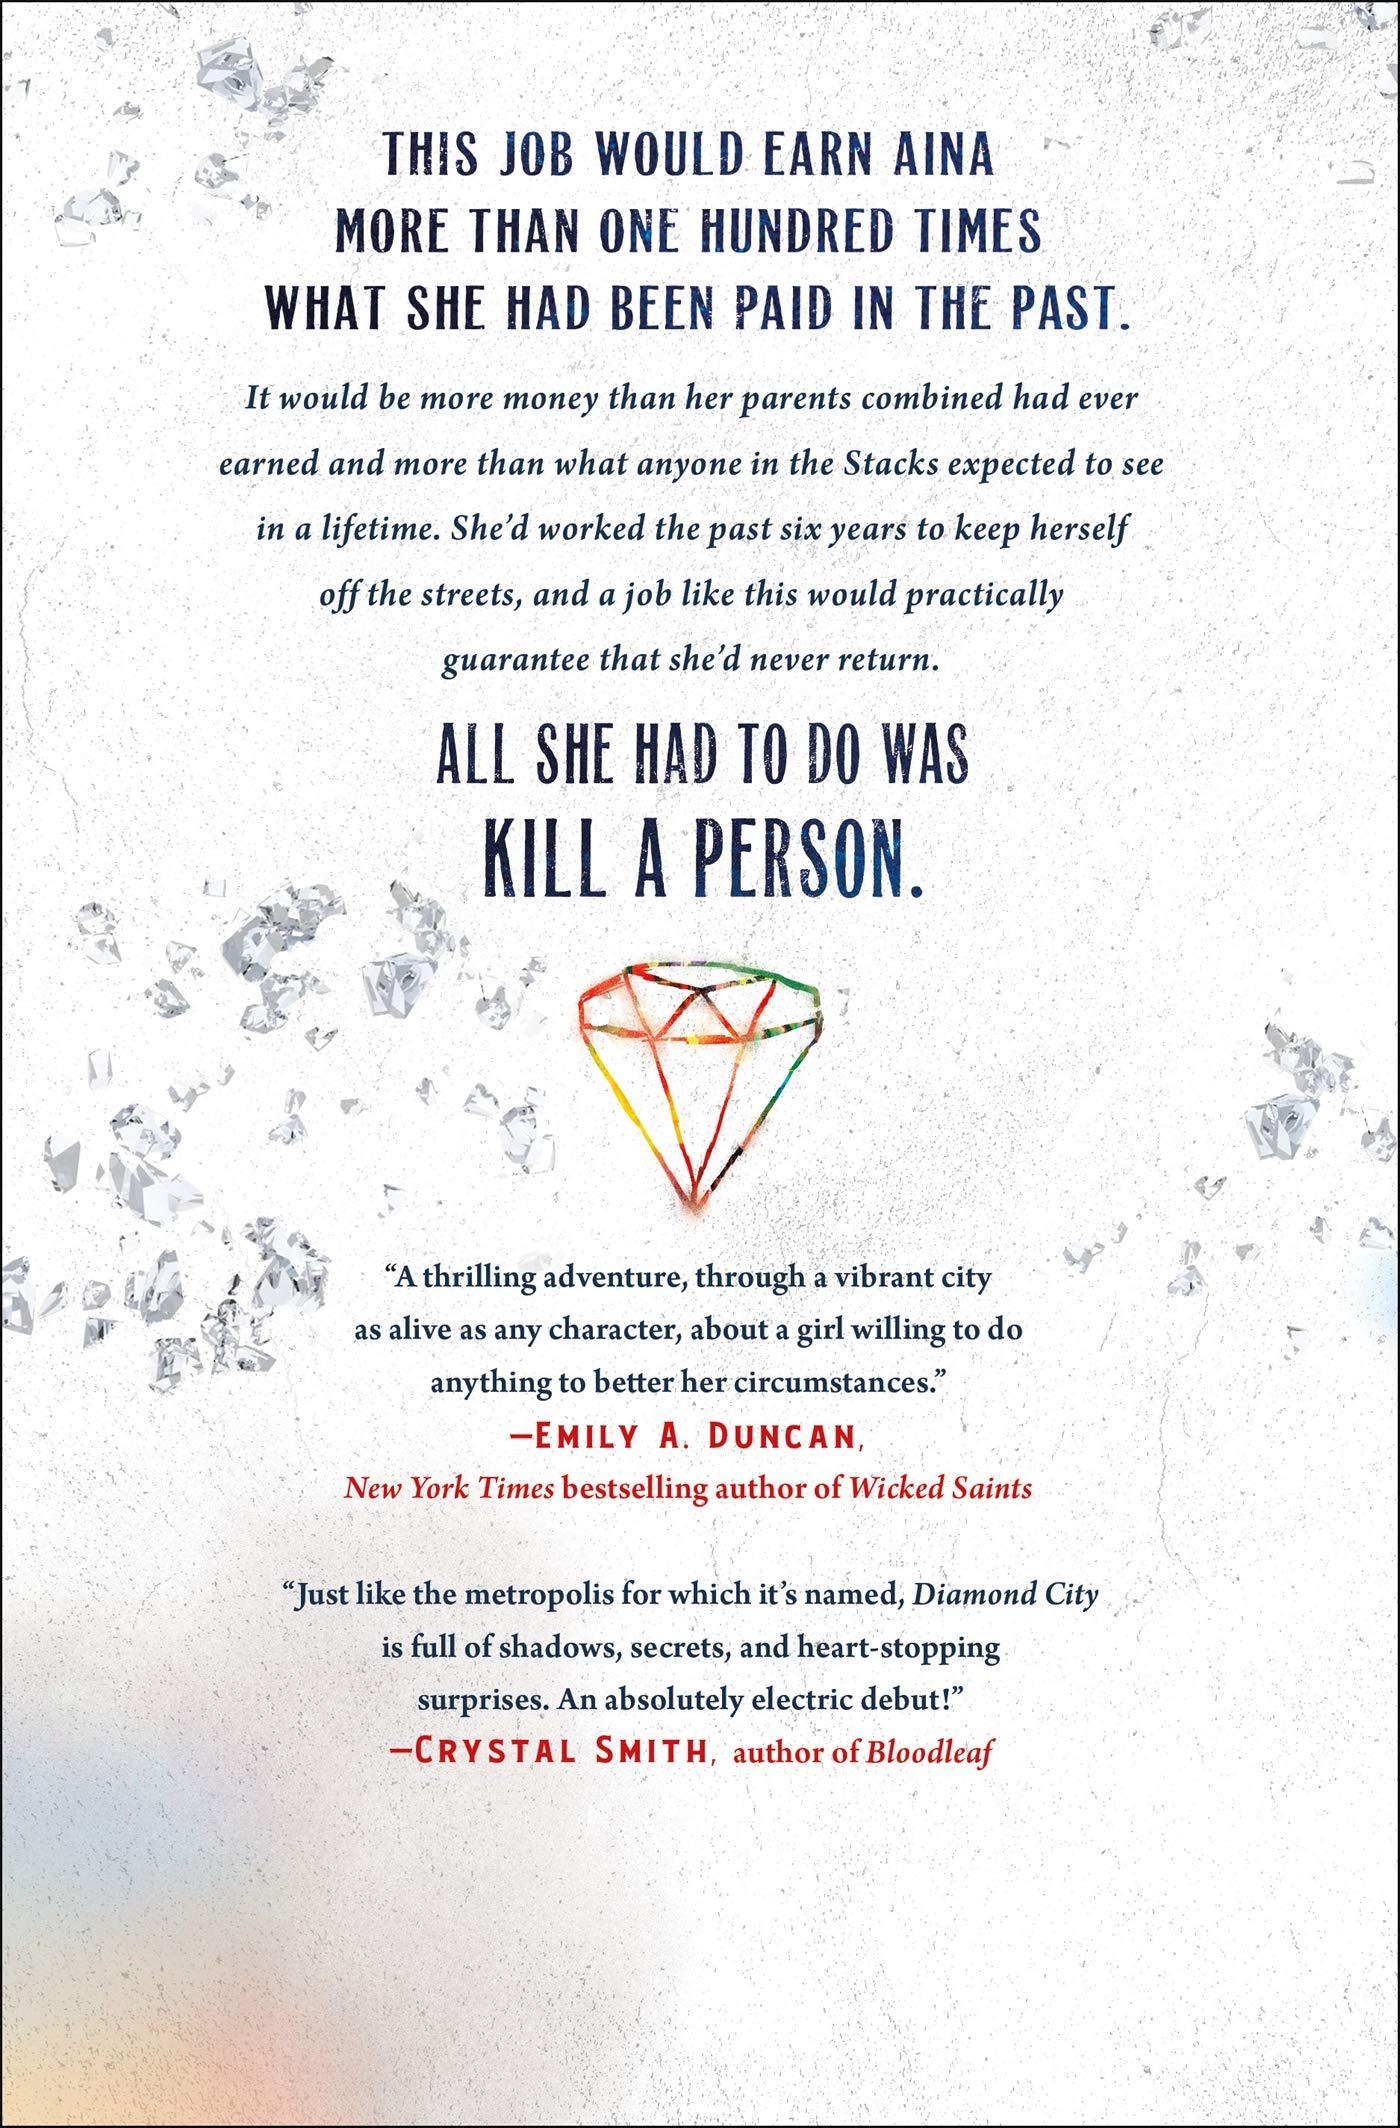 Amazon.com: Diamond City: A Novel (9781250220448): Francesca ...